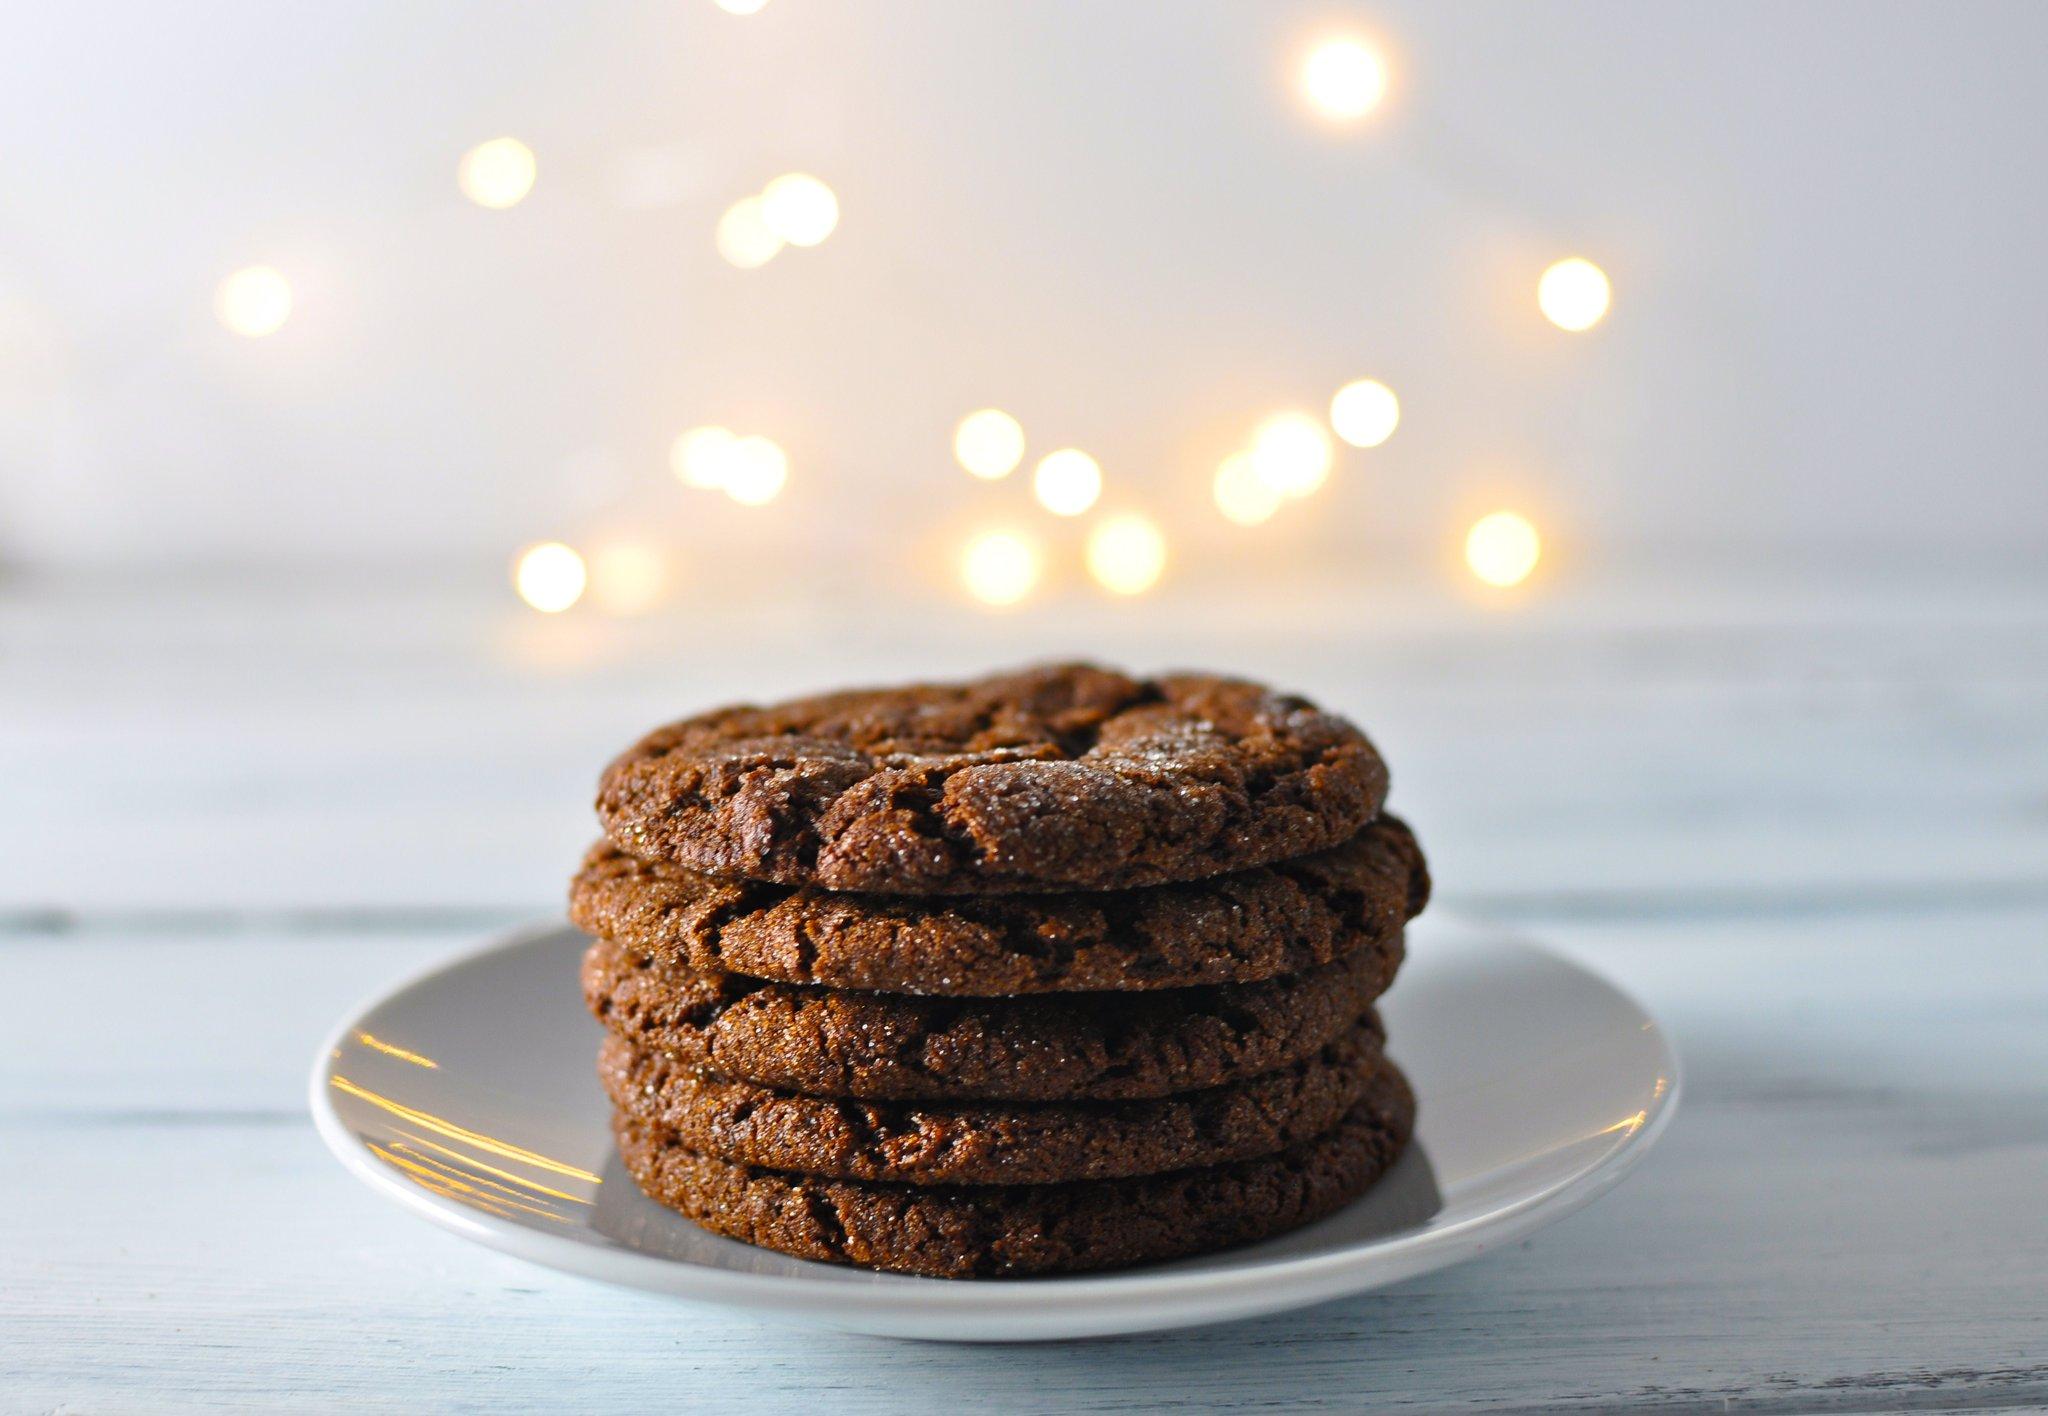 Uncle Eddie's Vegan Cookies from LA: The best mail-order cookies around the country